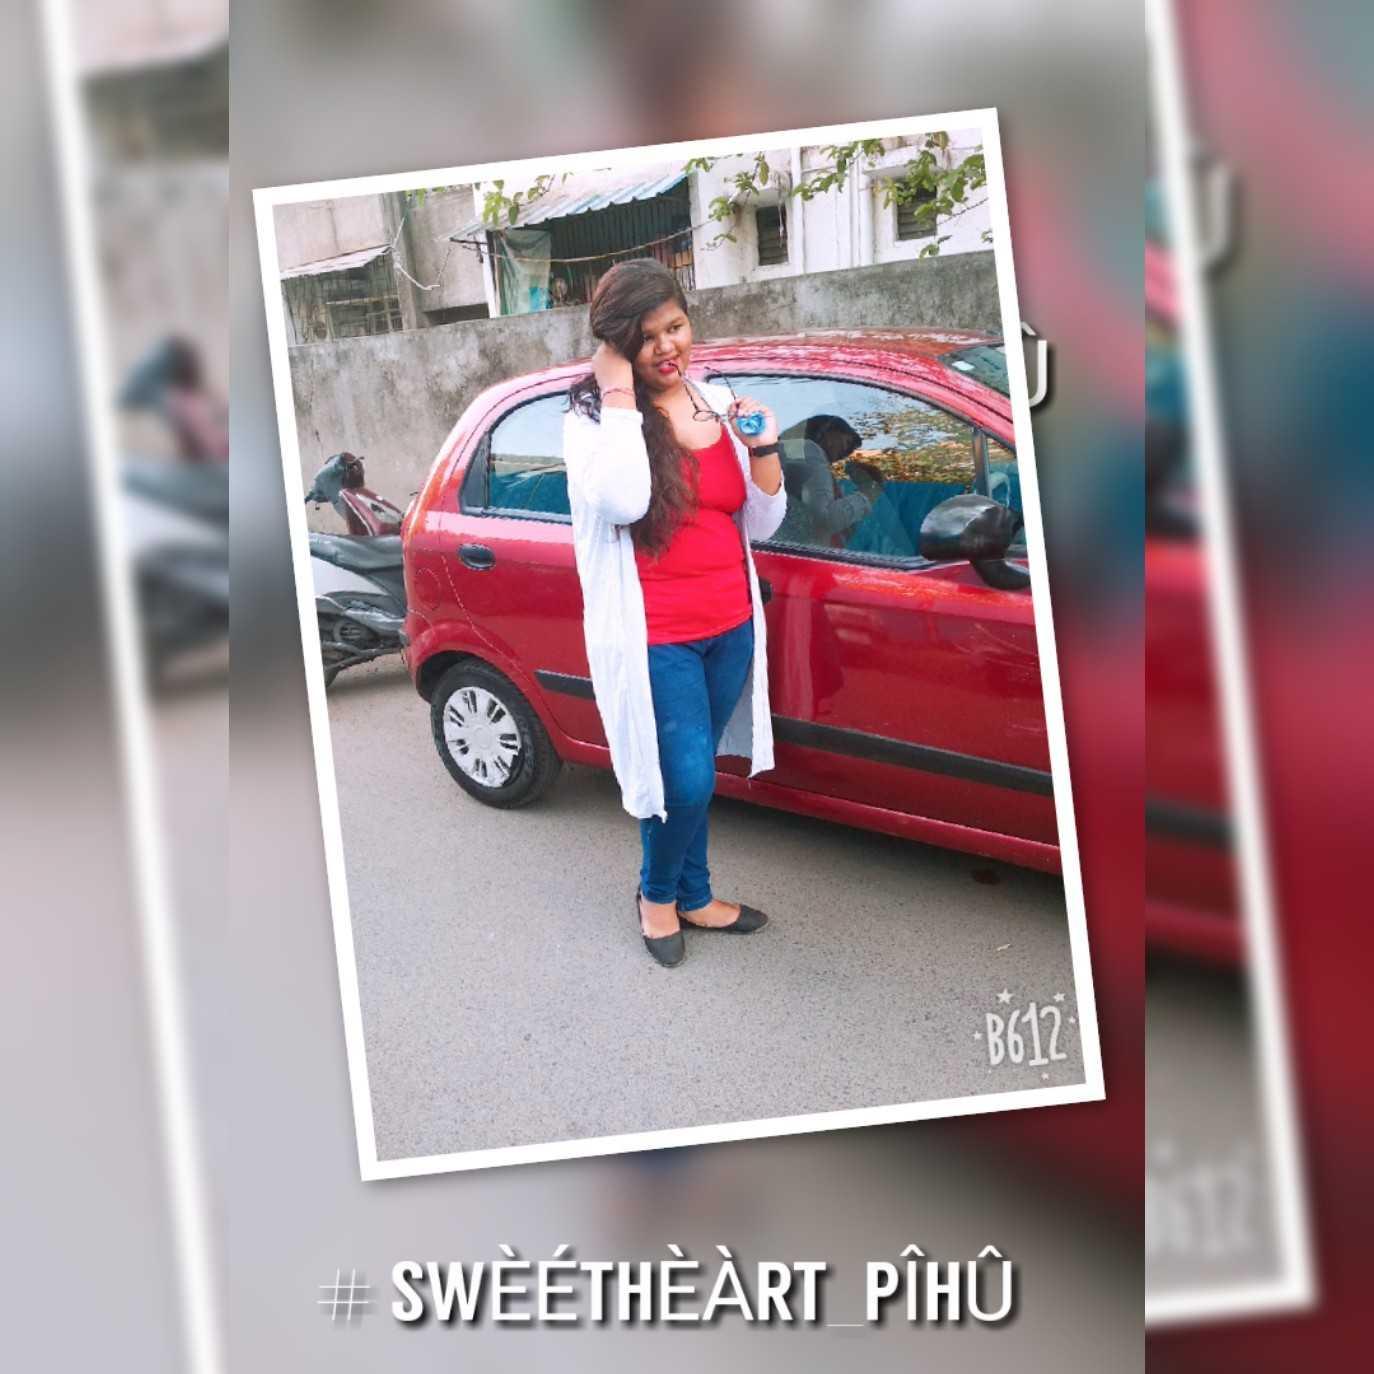 SWEETHEART PÍHÛ